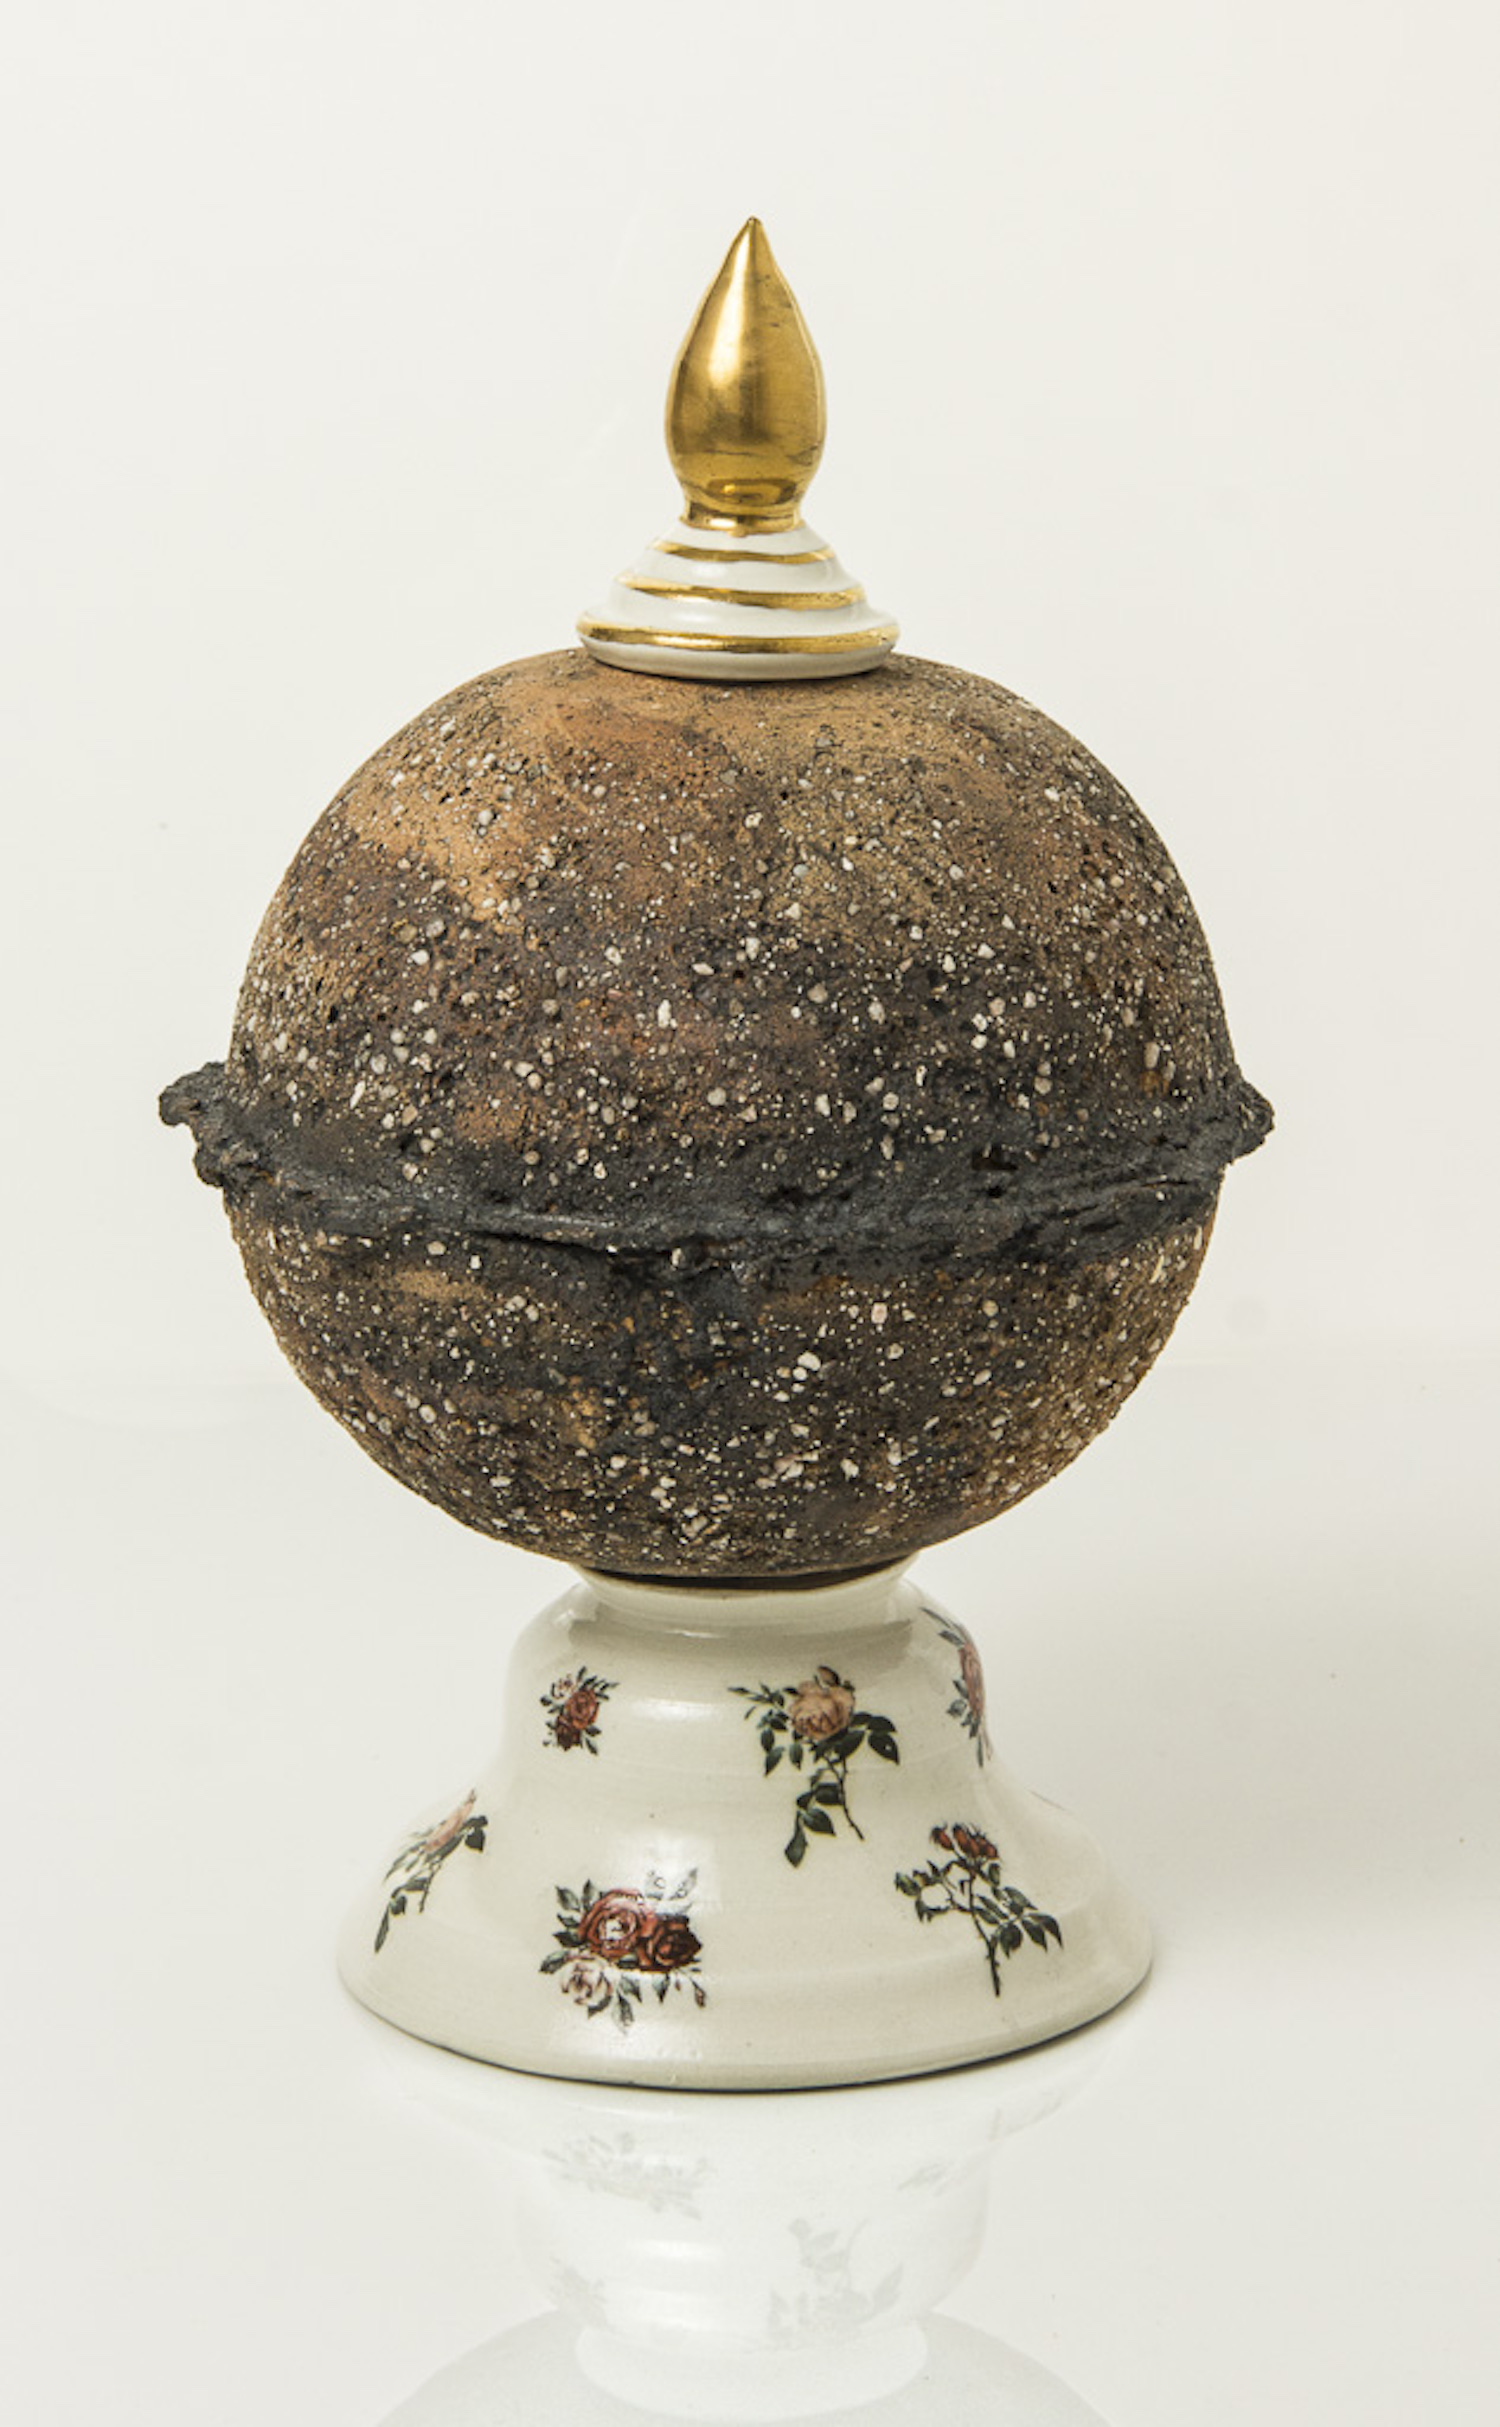 ceramic globe sculpture with bottle stopper